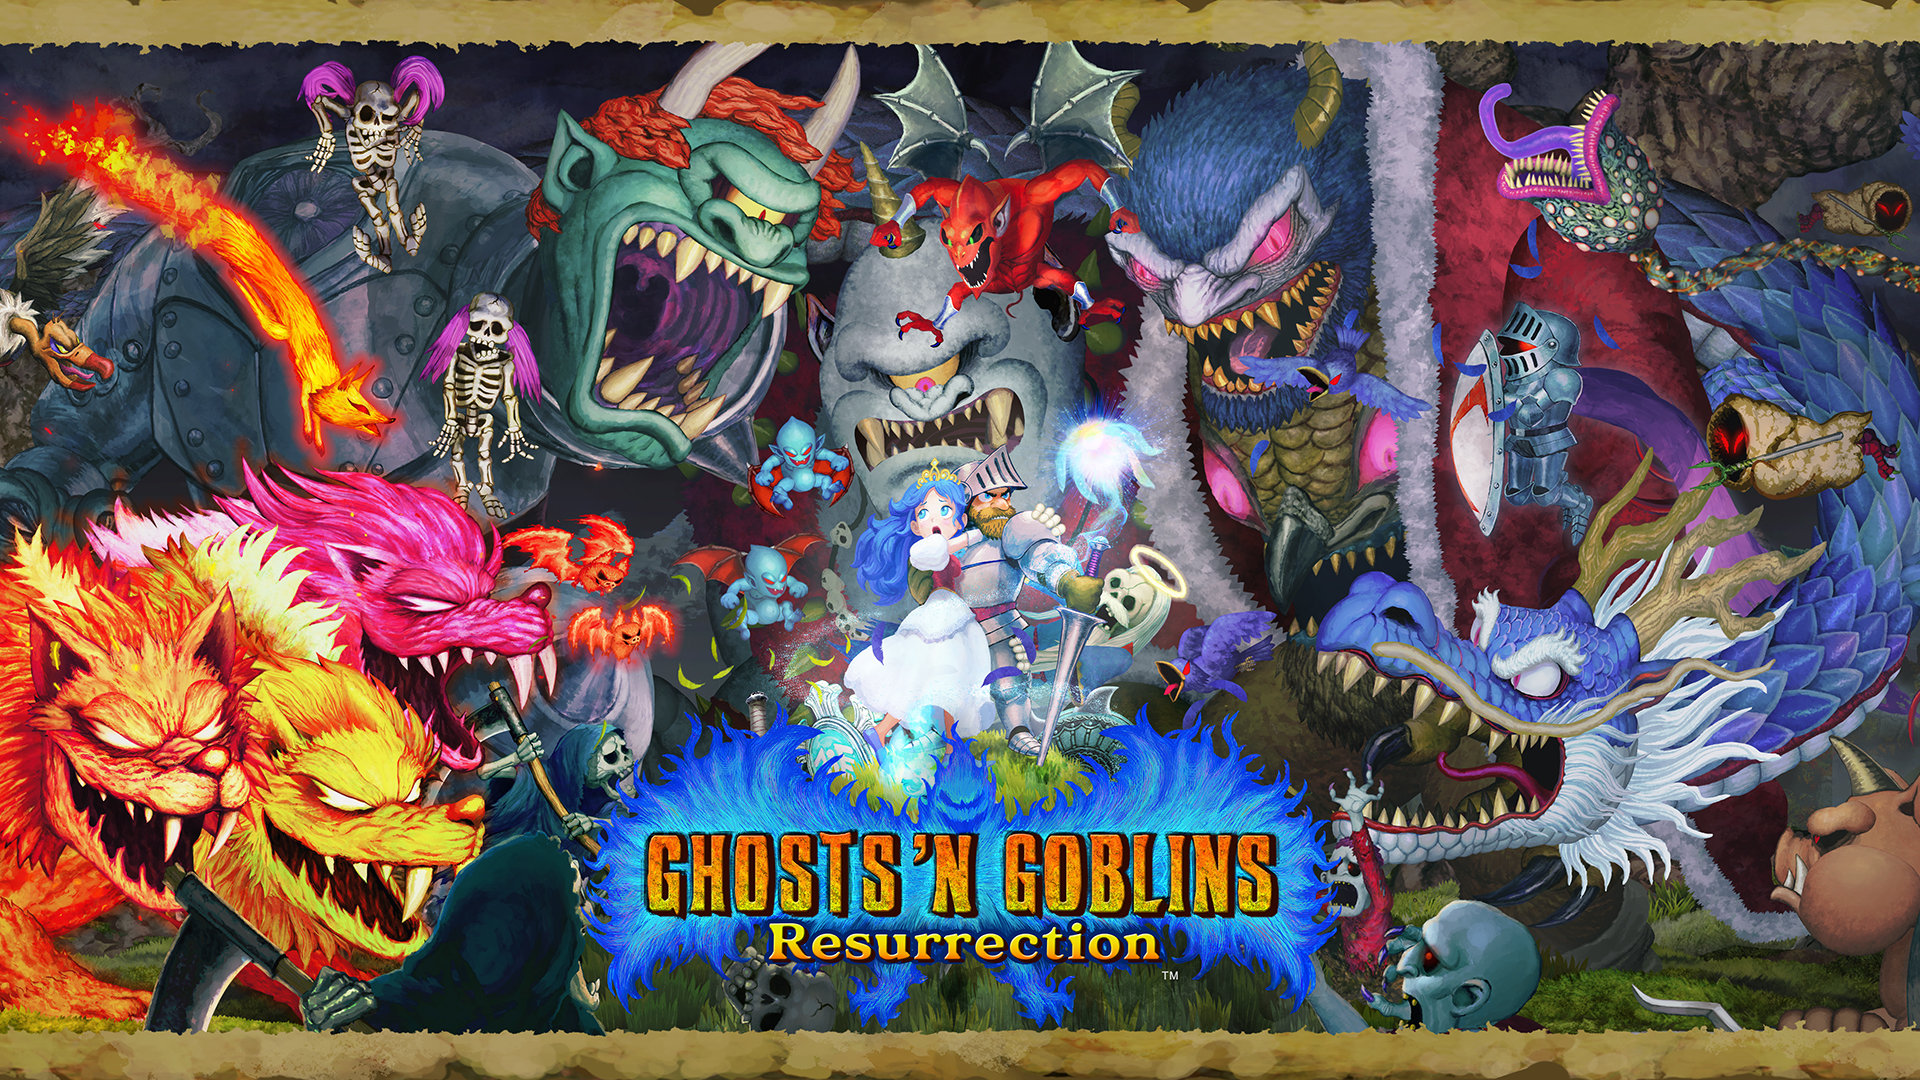 Ghosts 'N Goblins Resurrection - Poster